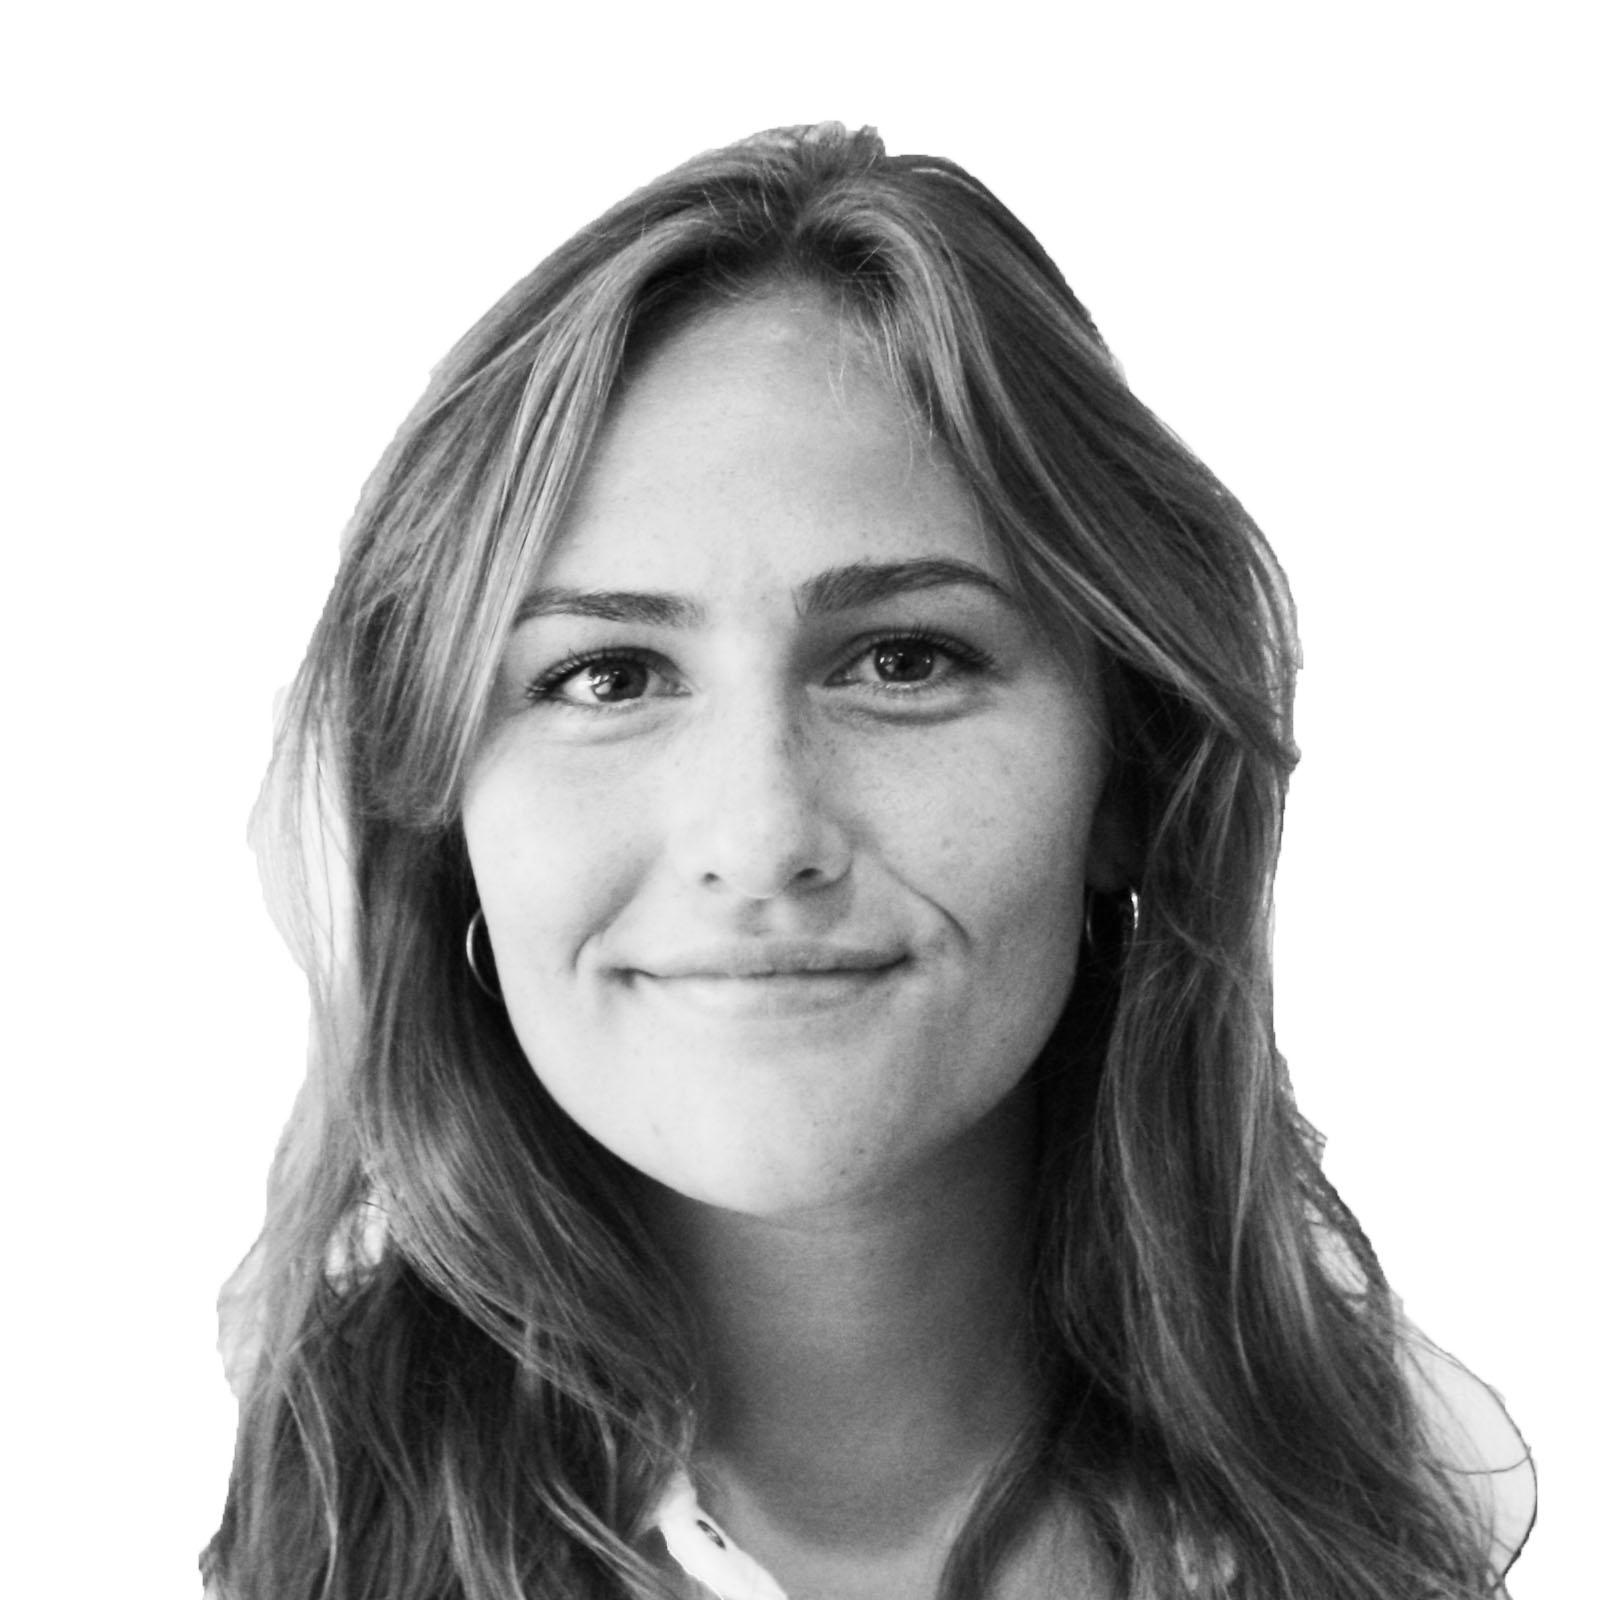 Sophie-Amalie Voss